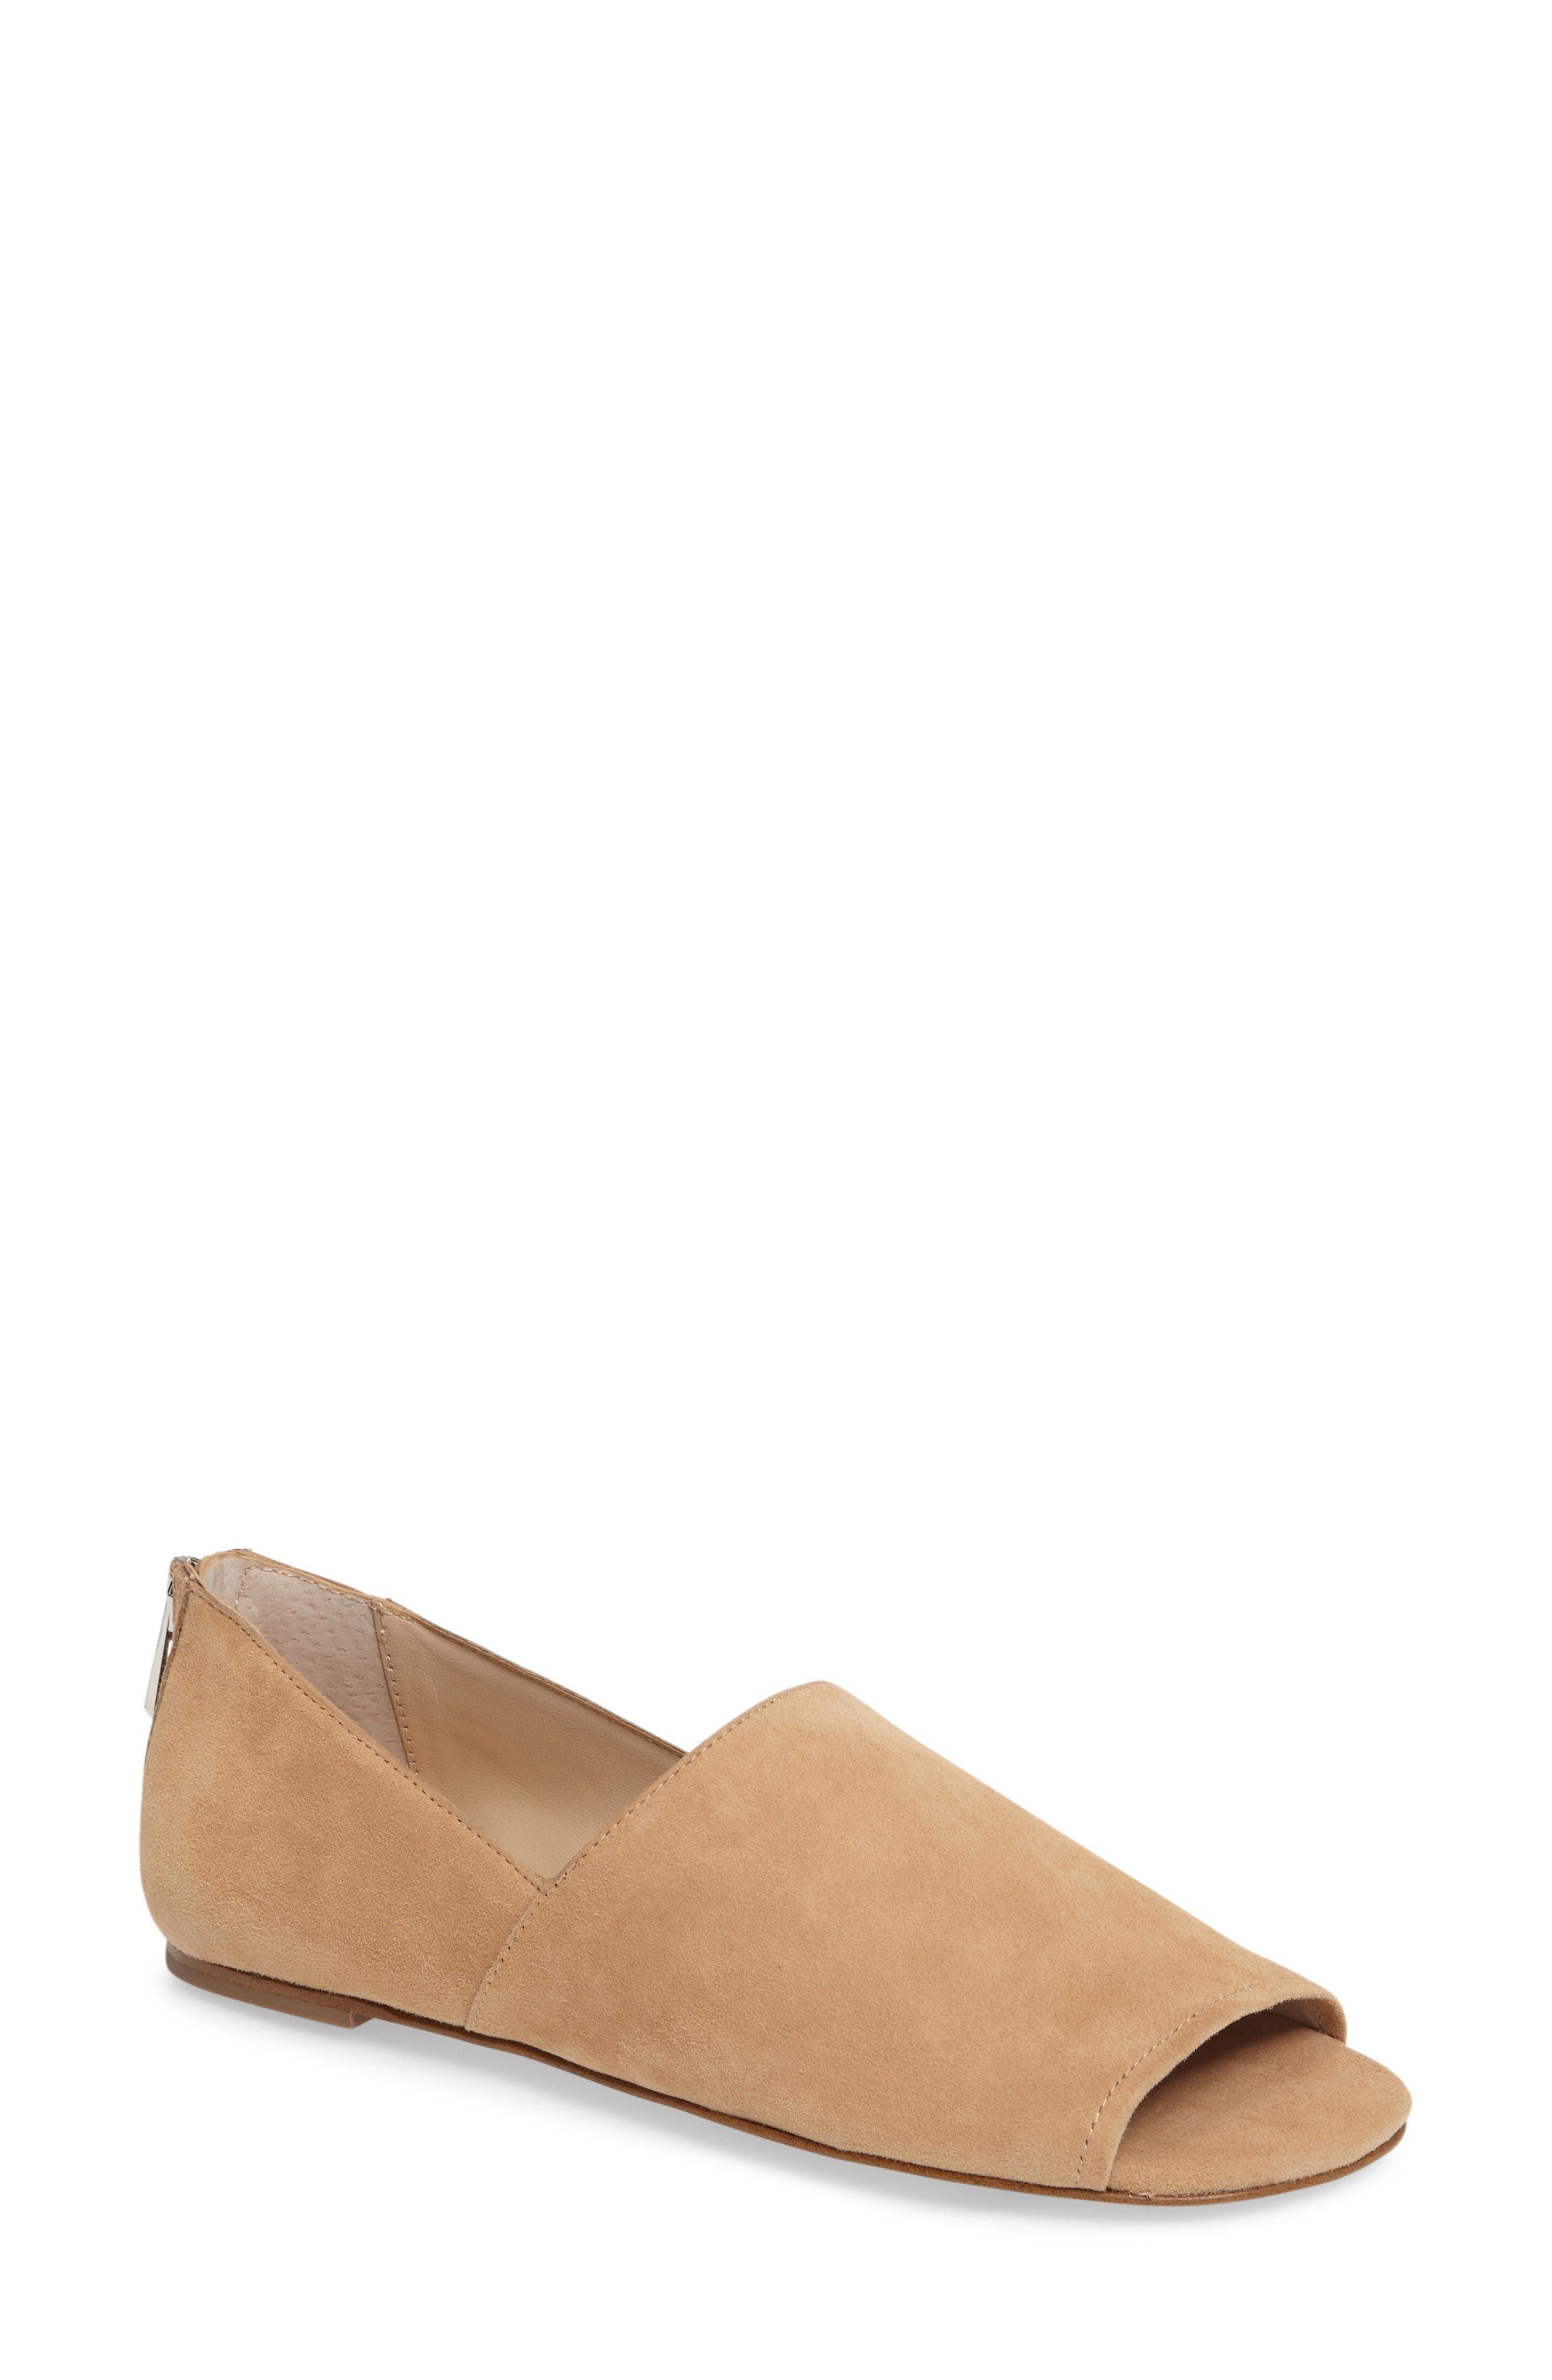 Maxine Peep Toe Flat,                             Main thumbnail 1, color,                             Natural